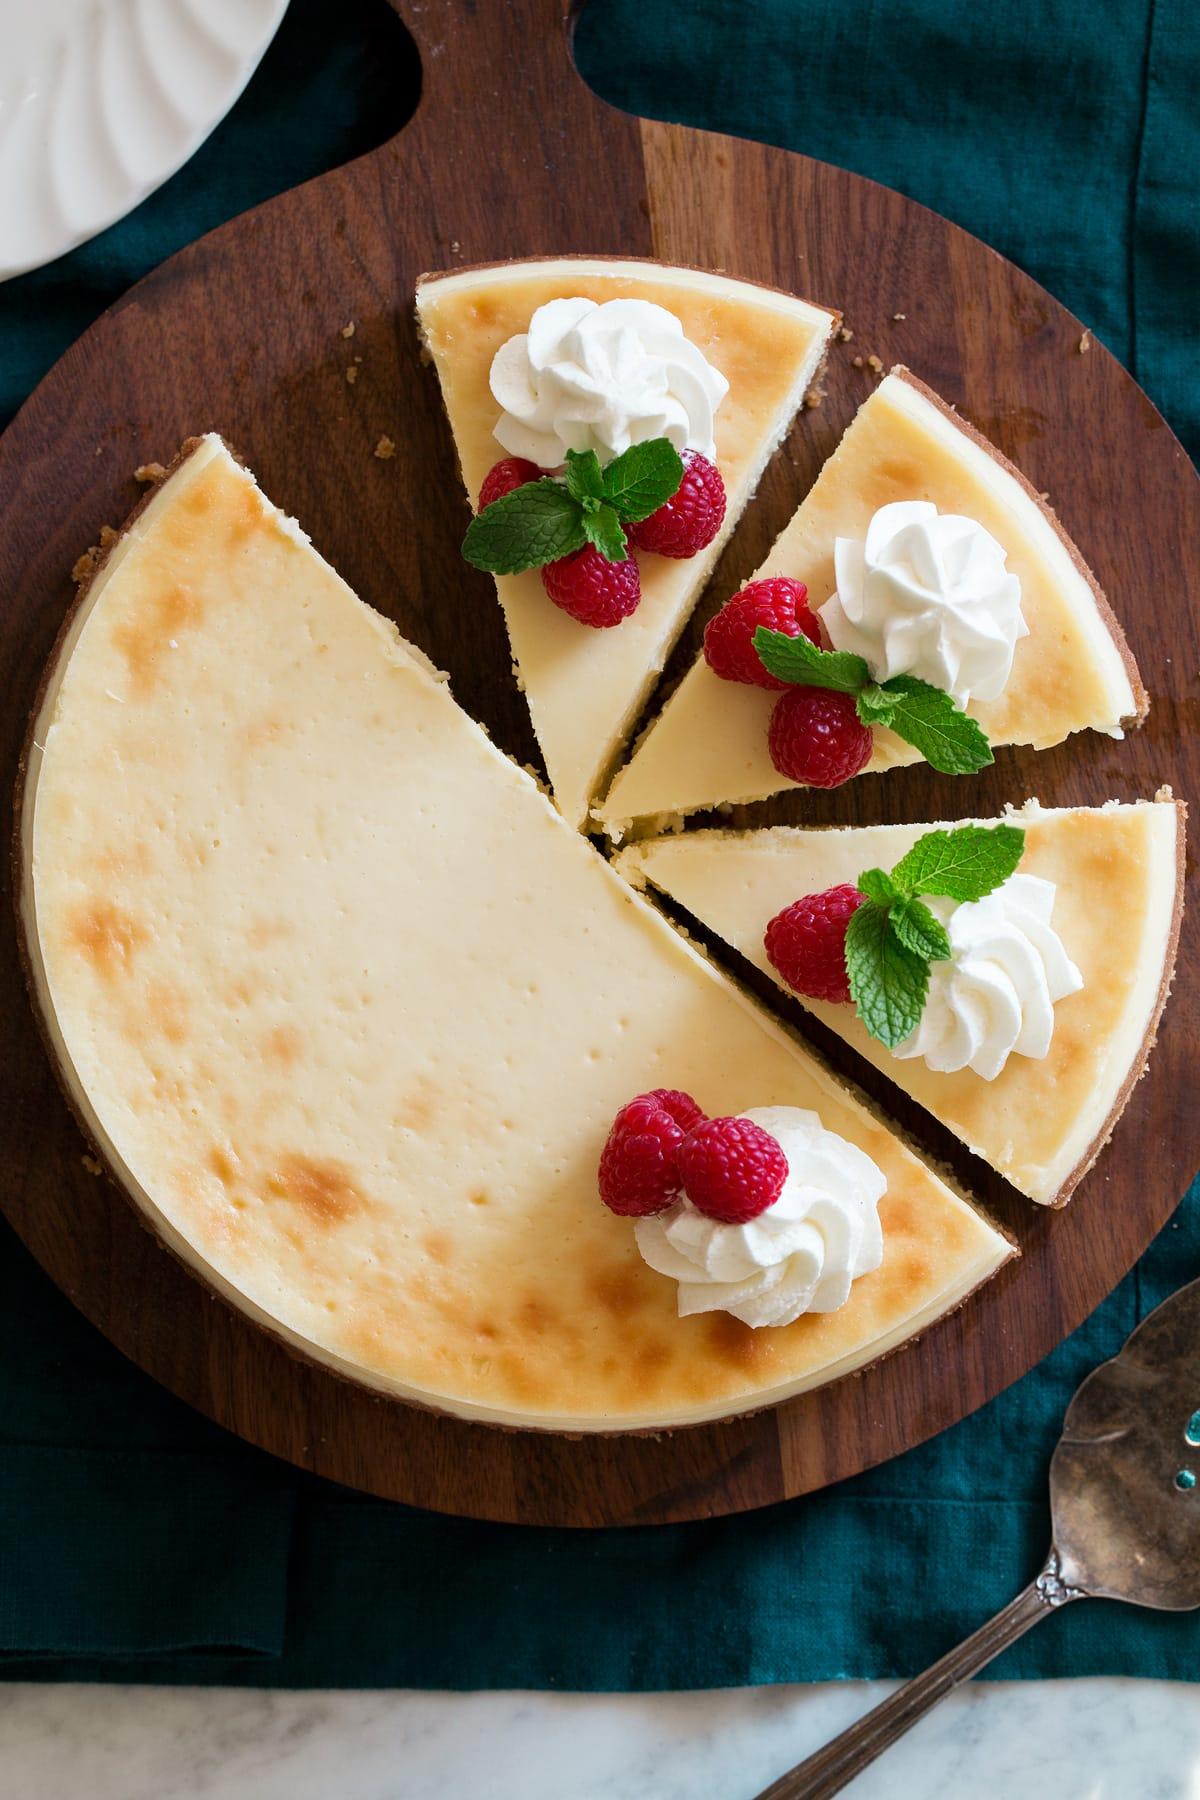 Overhead image of sliced cheesecake.